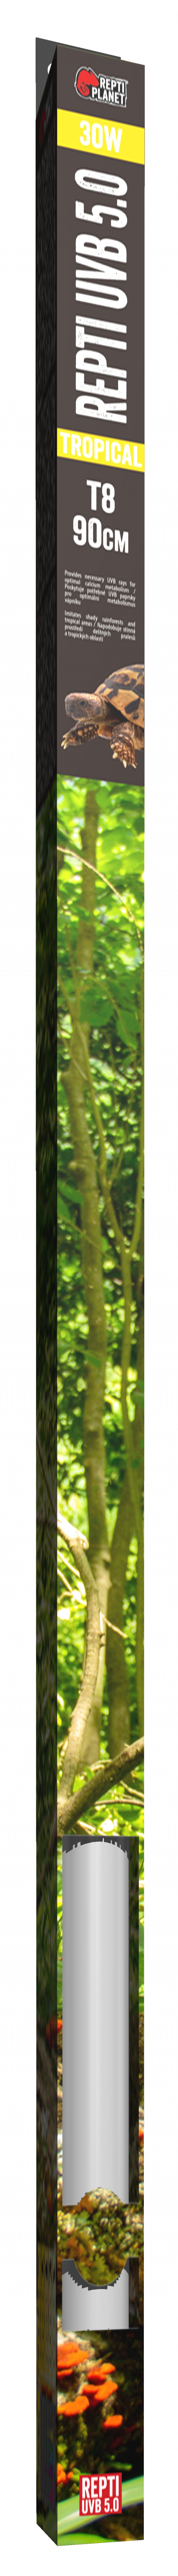 Лампа для террариумов - ReptiPlanet Repti T8 UVB 5.0 30W, 90 см title=